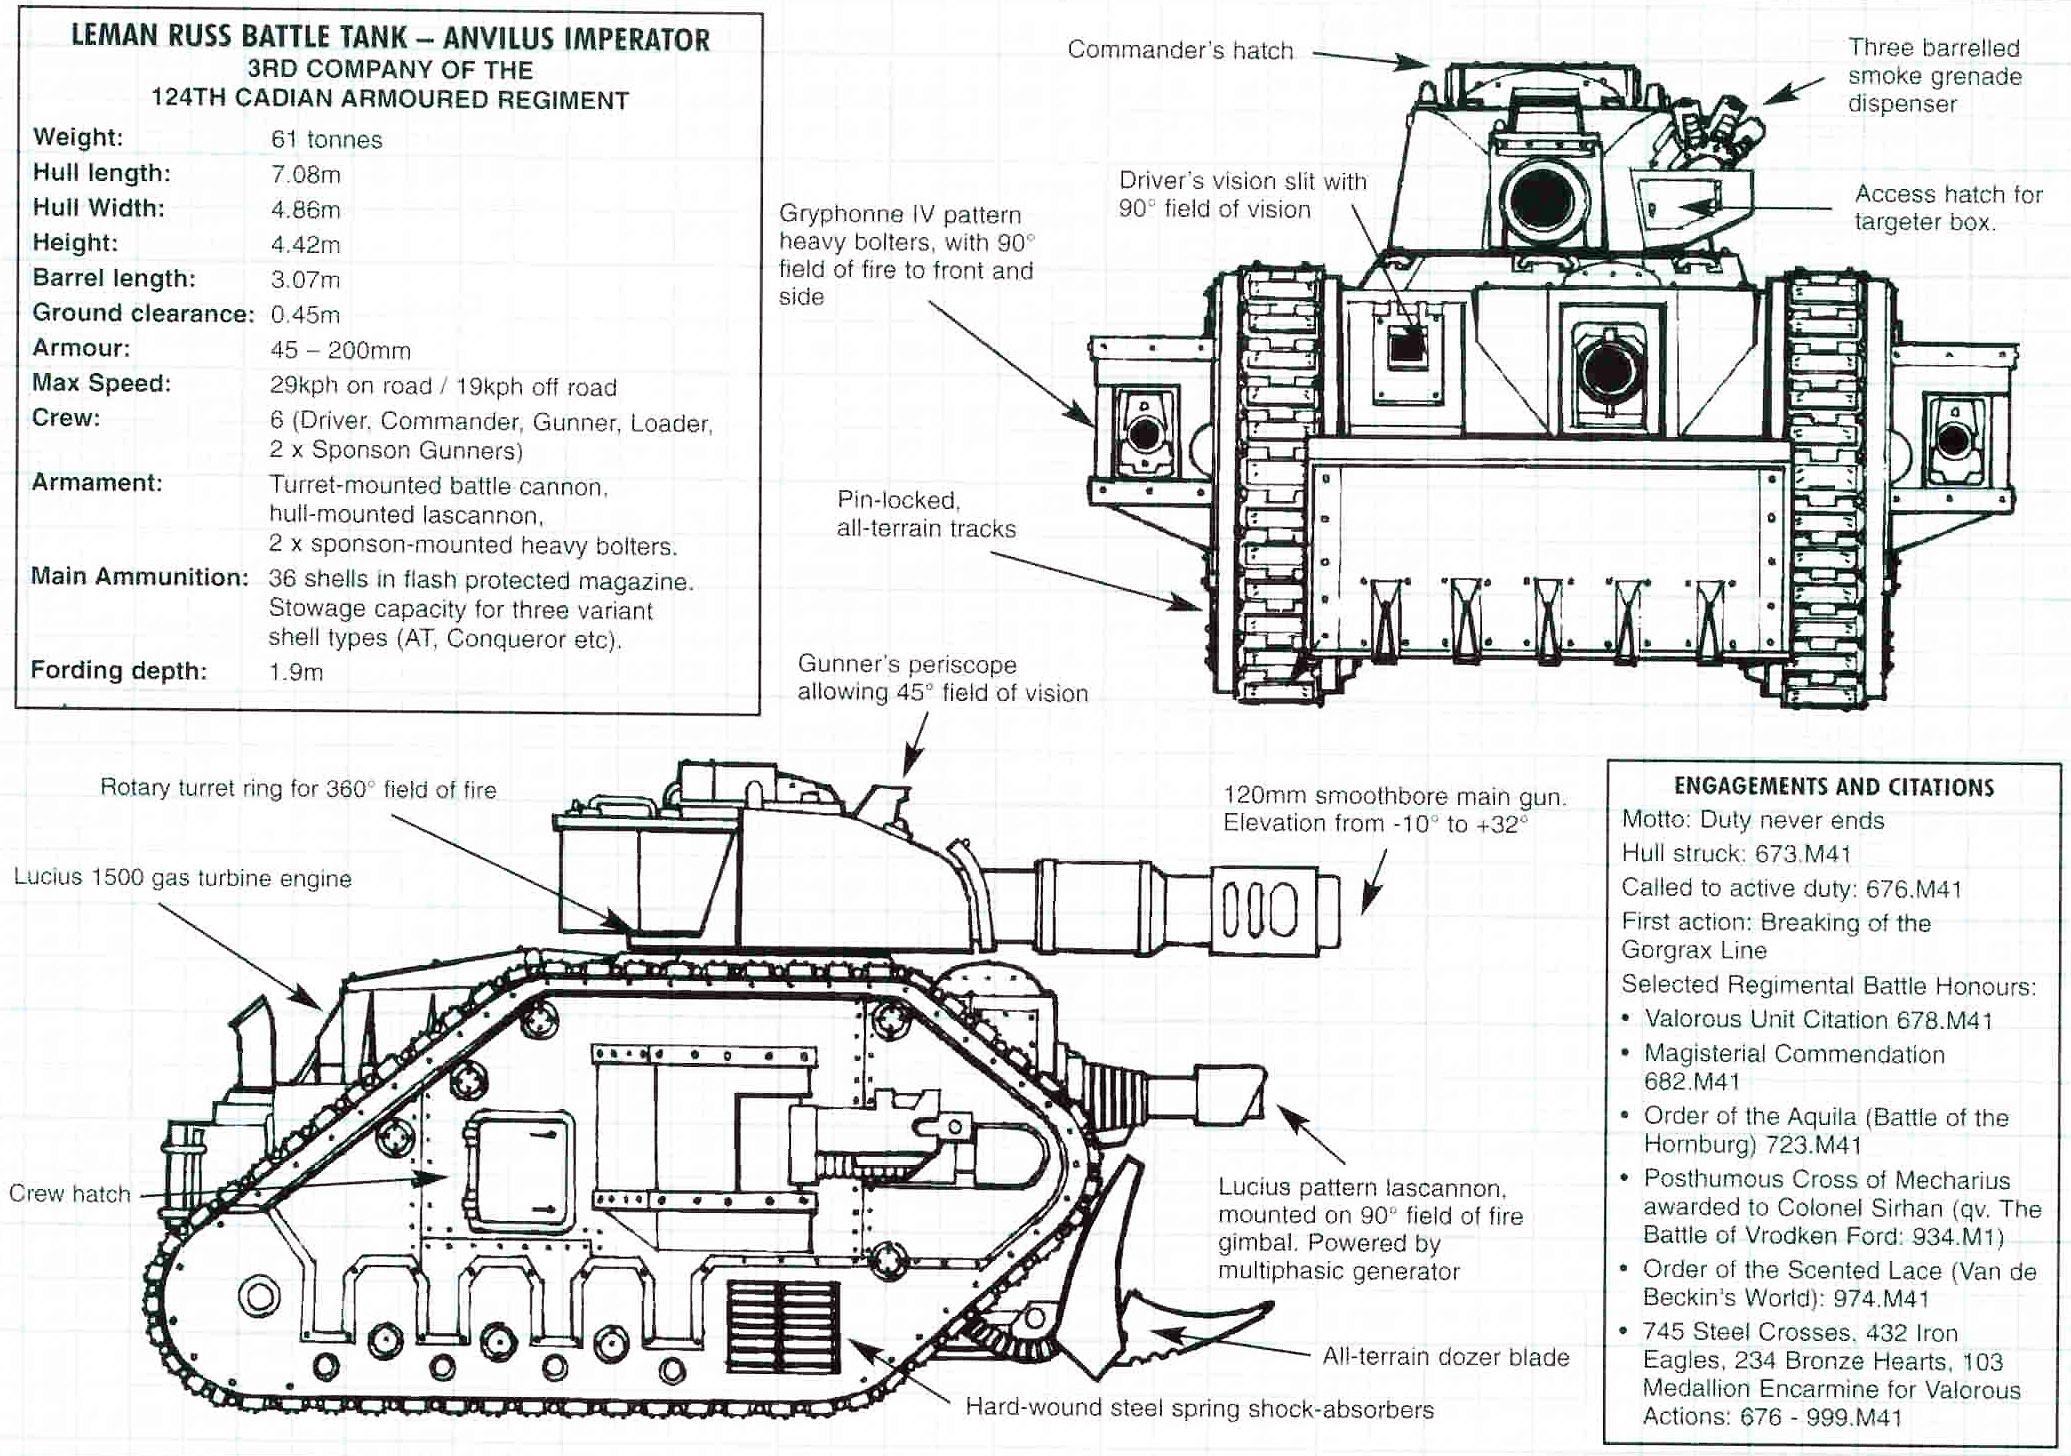 Warhammer 40k Tank